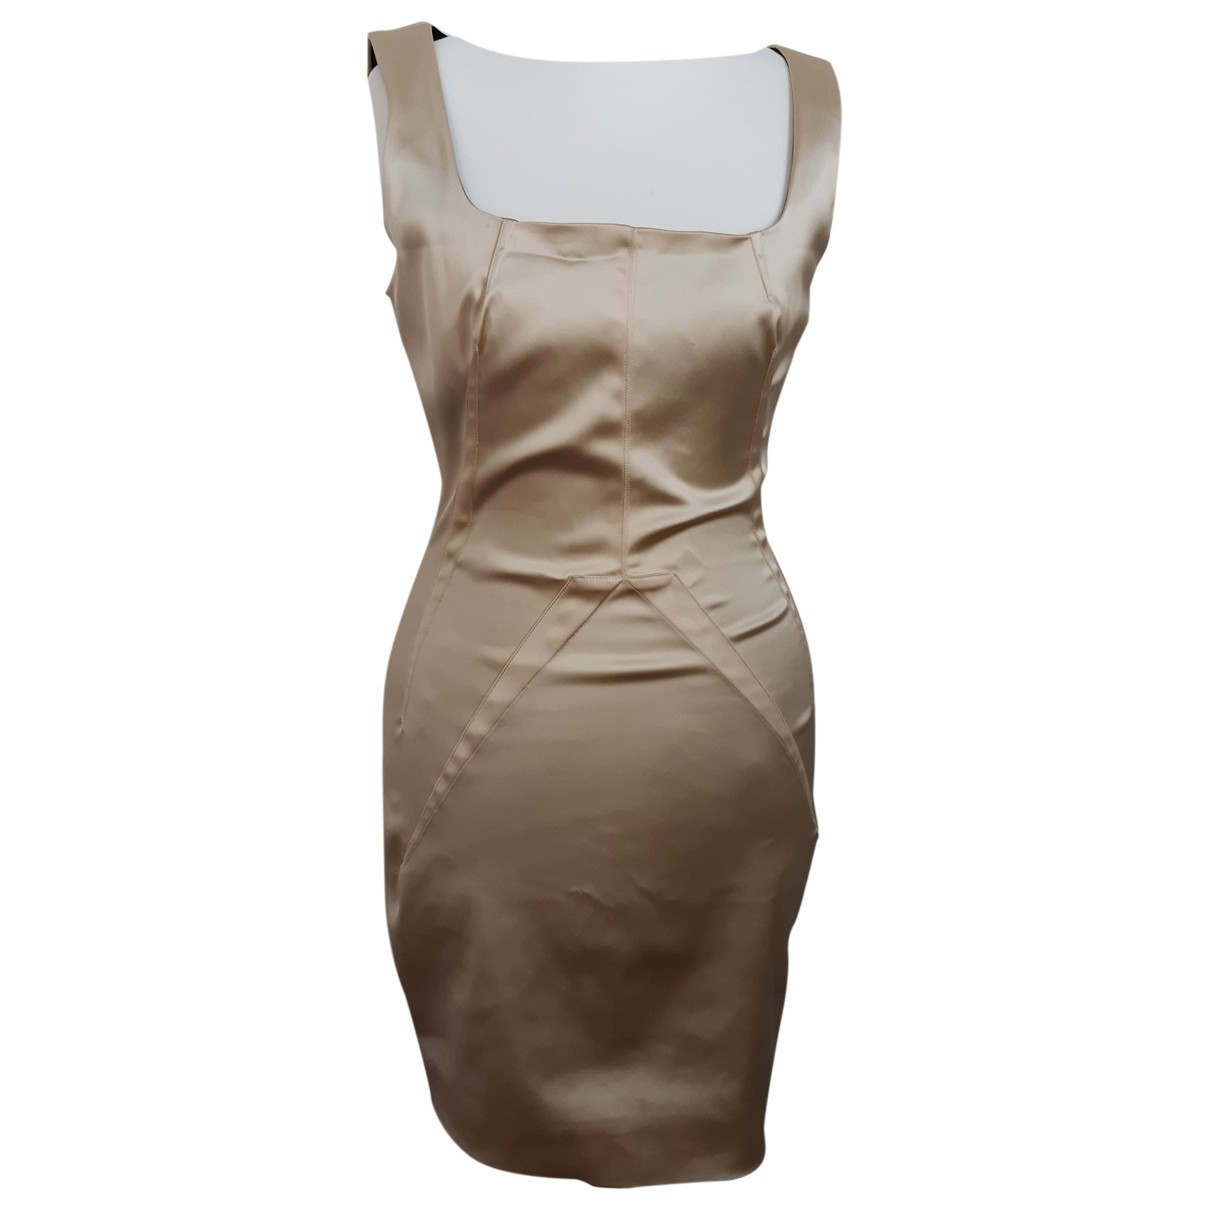 D&g \N Kleid in  Gold Synthetik